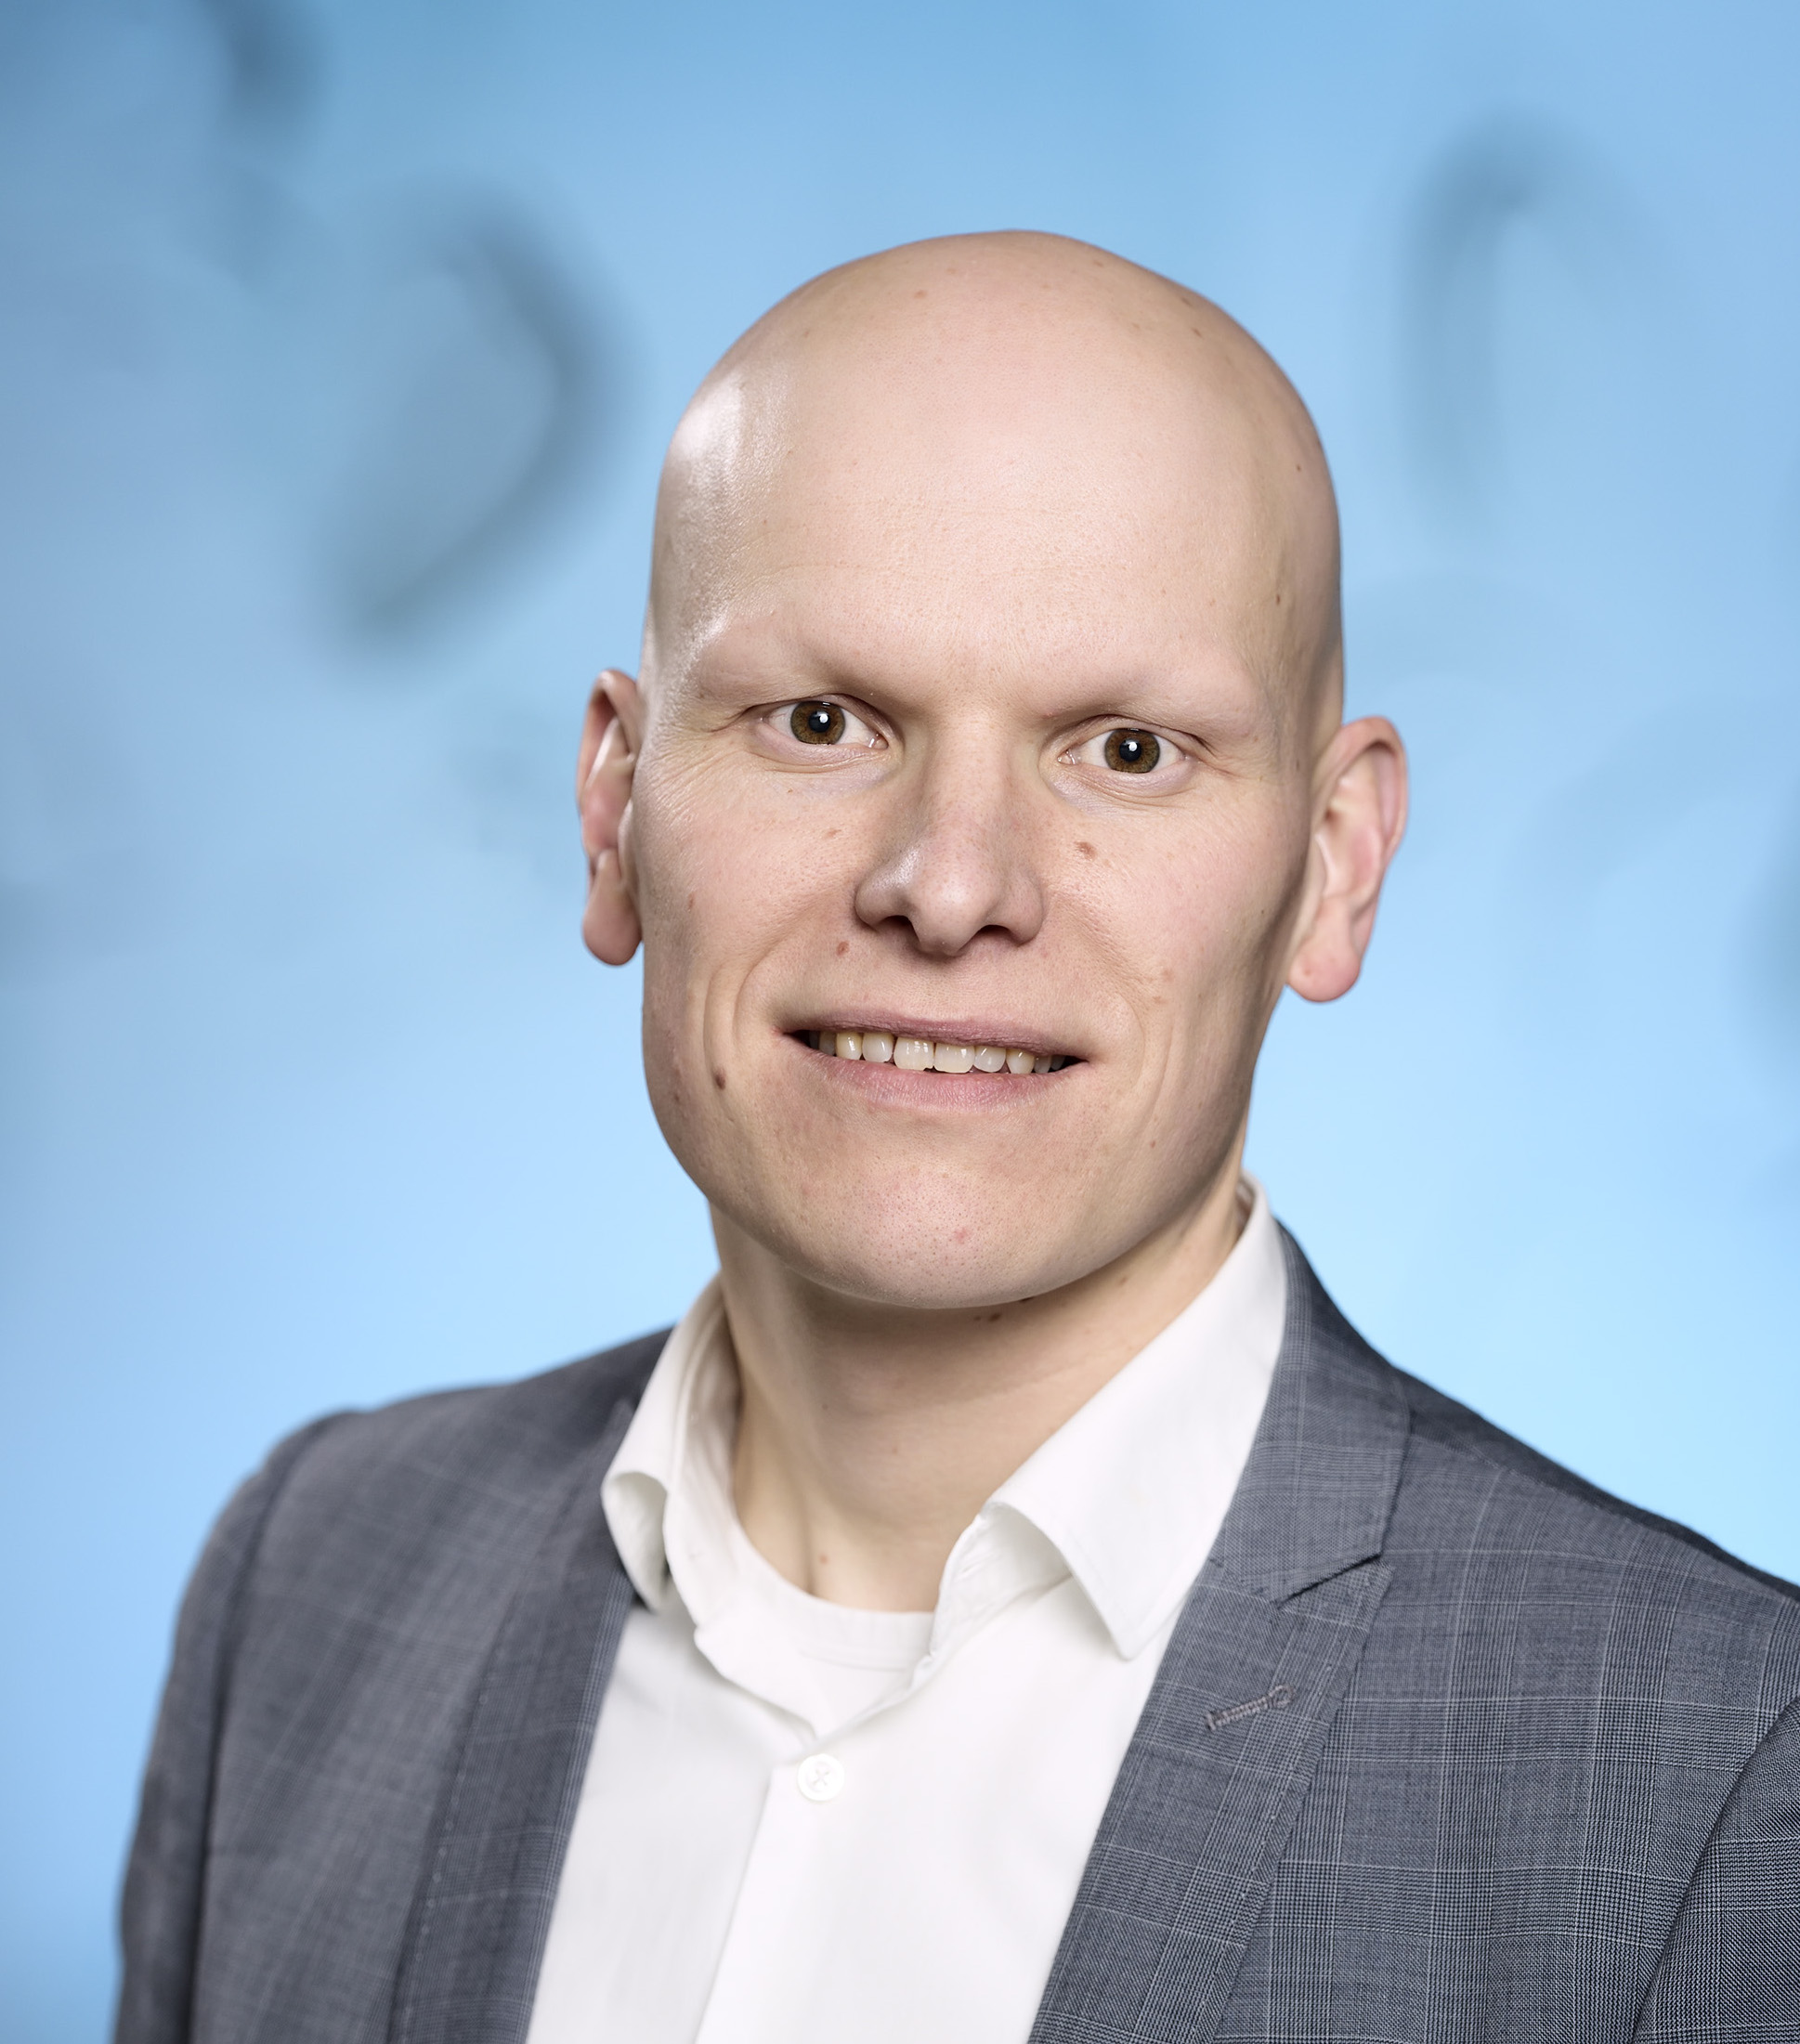 Hornikx, prof.dr.ir. M.C.J.